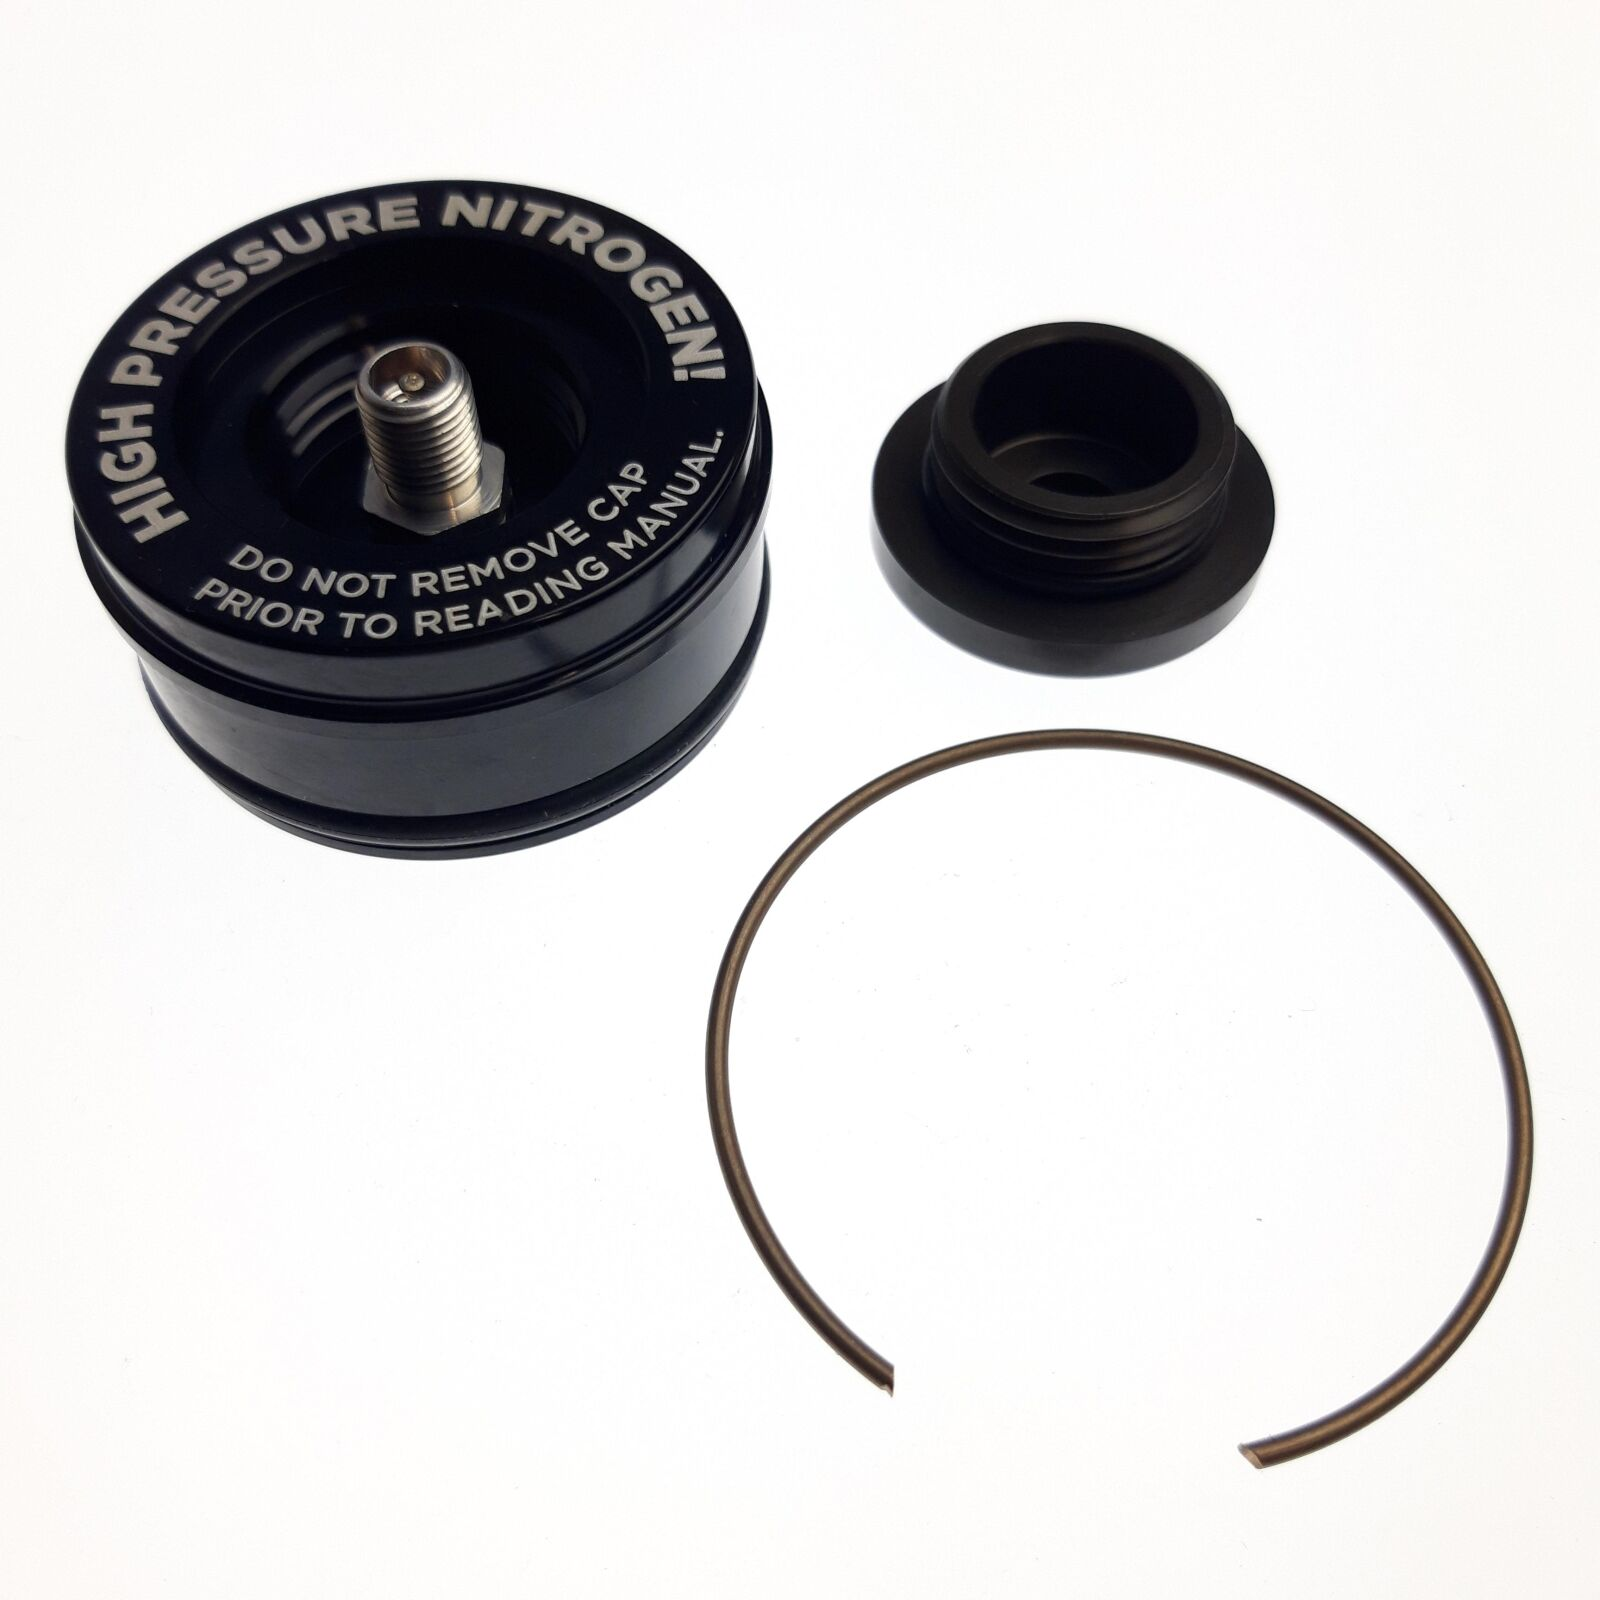 Reservoir End Cap Assembly:(1.834 Bora)Al6061, Black Ano II, Laser Etch Warning, Threaded